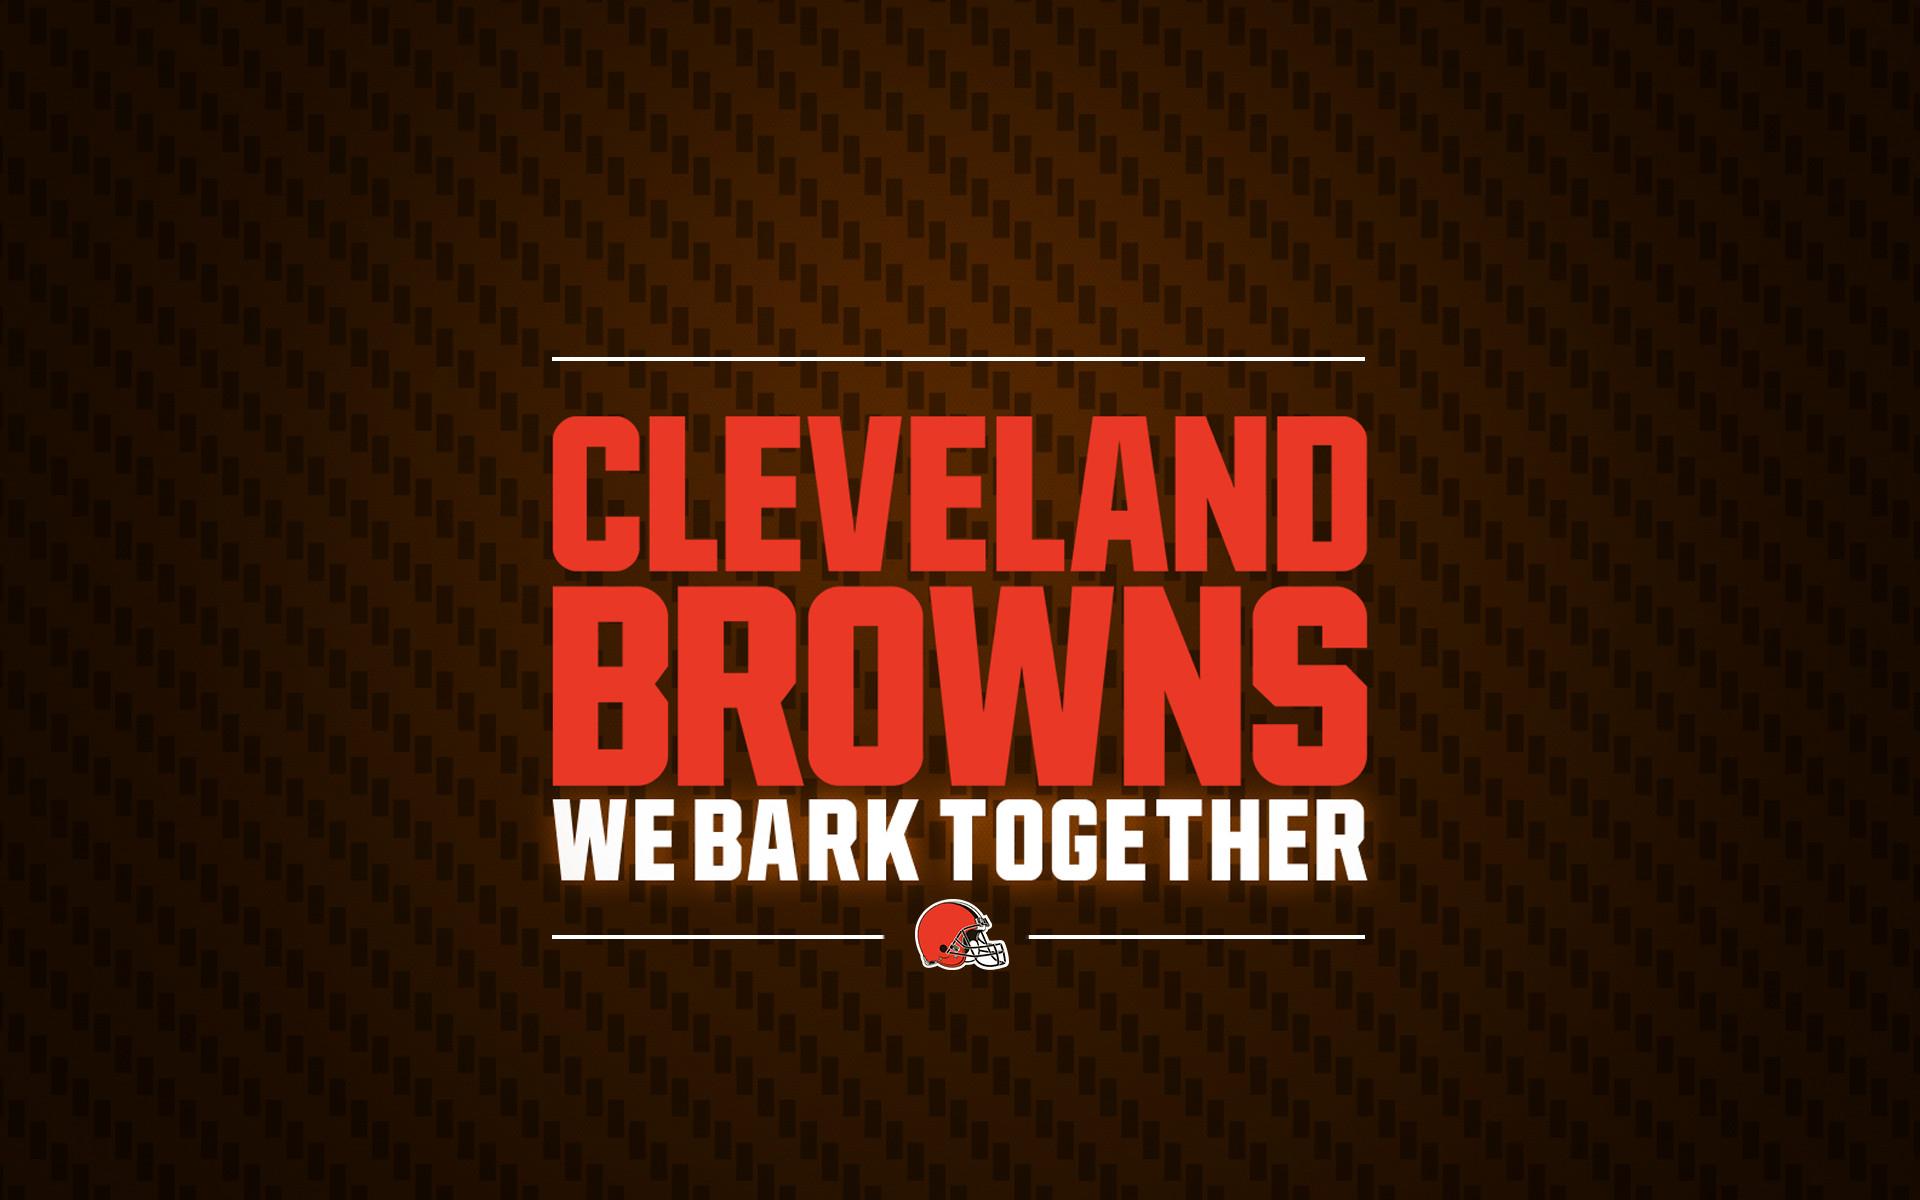 Cleveland Browns 2018 Wallpaper ·① WallpaperTag